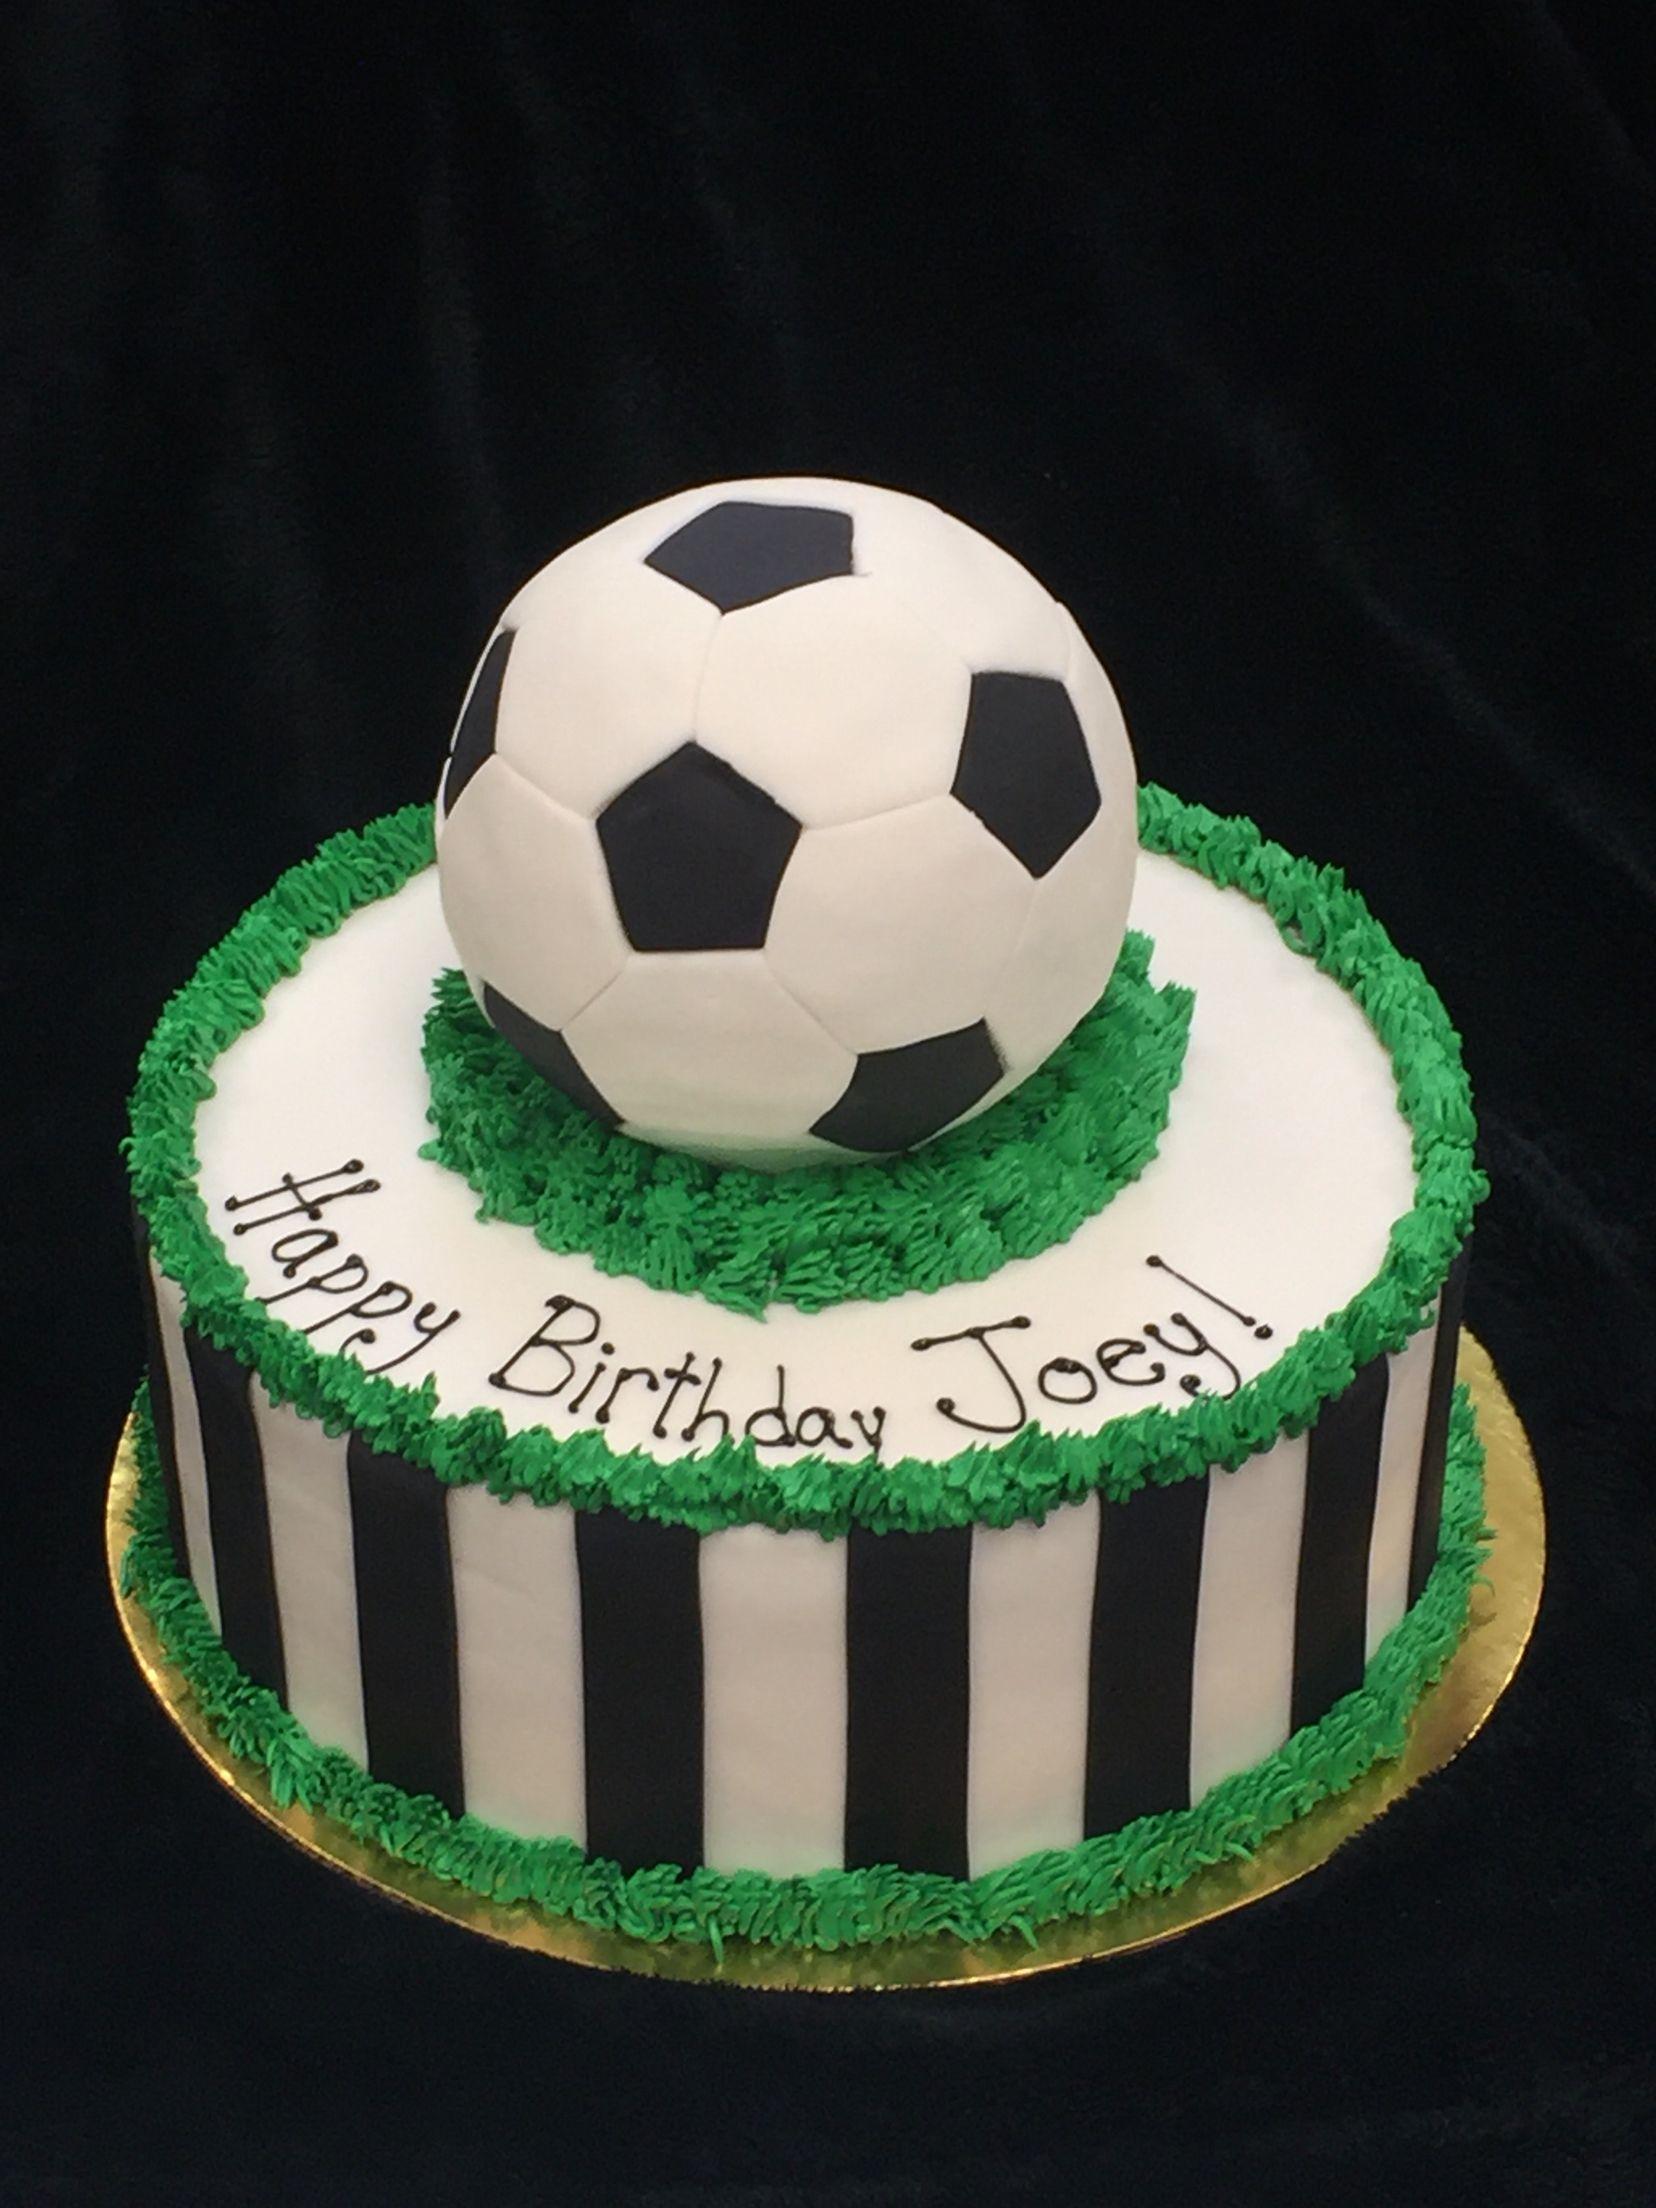 Soccer Theme Birthday Soccer Birthday Cakes Soccer Cake Themed Birthday Cakes